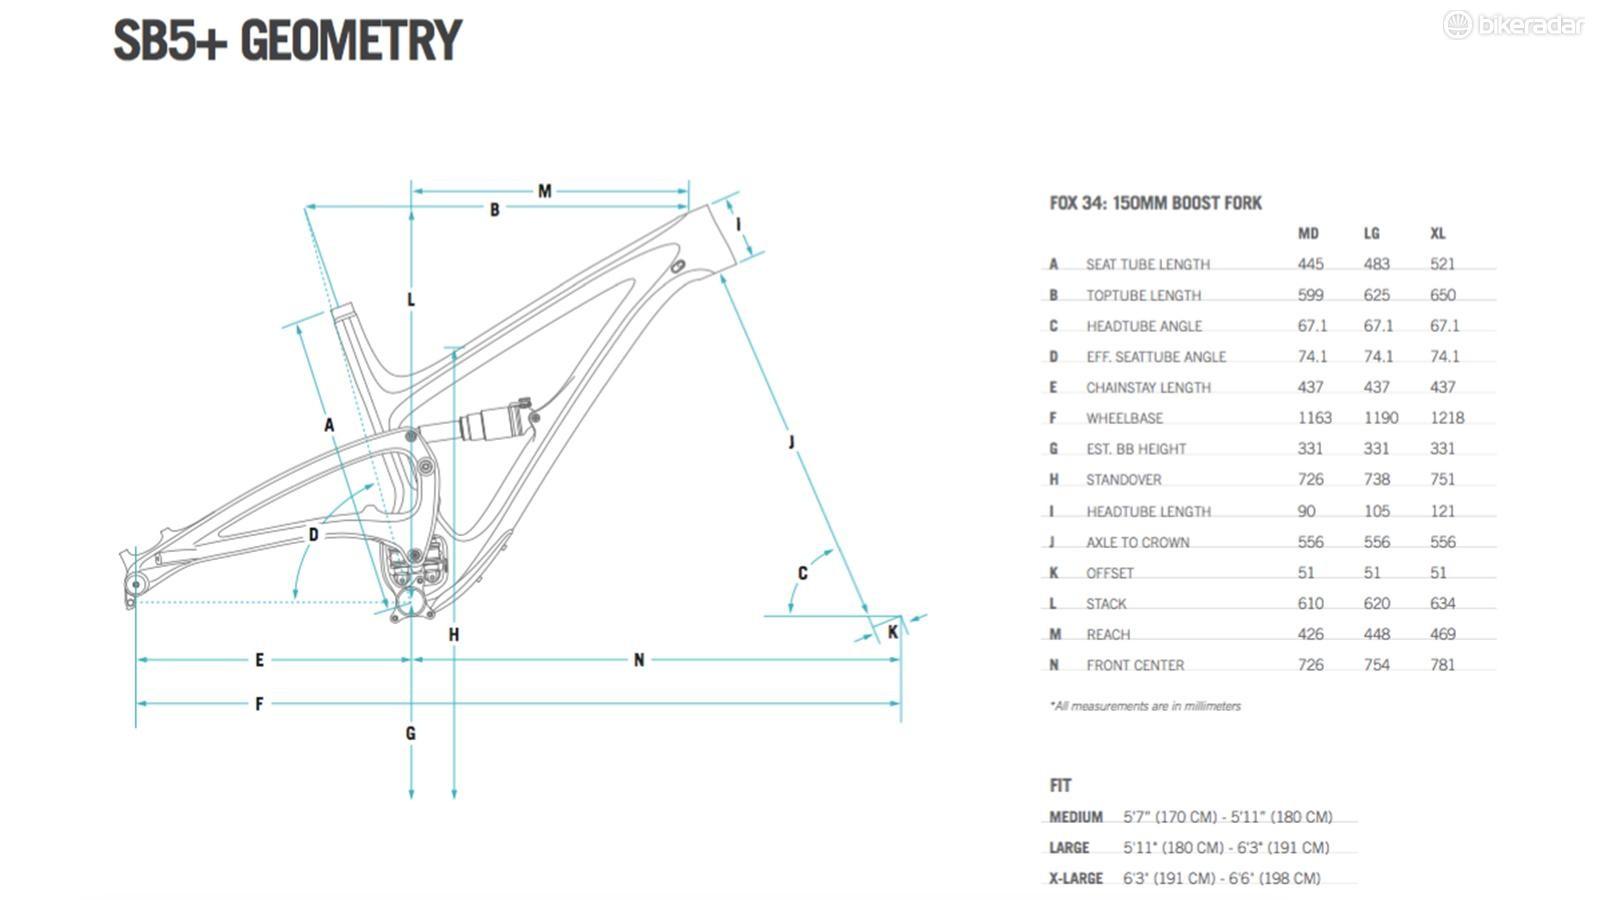 The SB5+ has similar geometry to the SB5